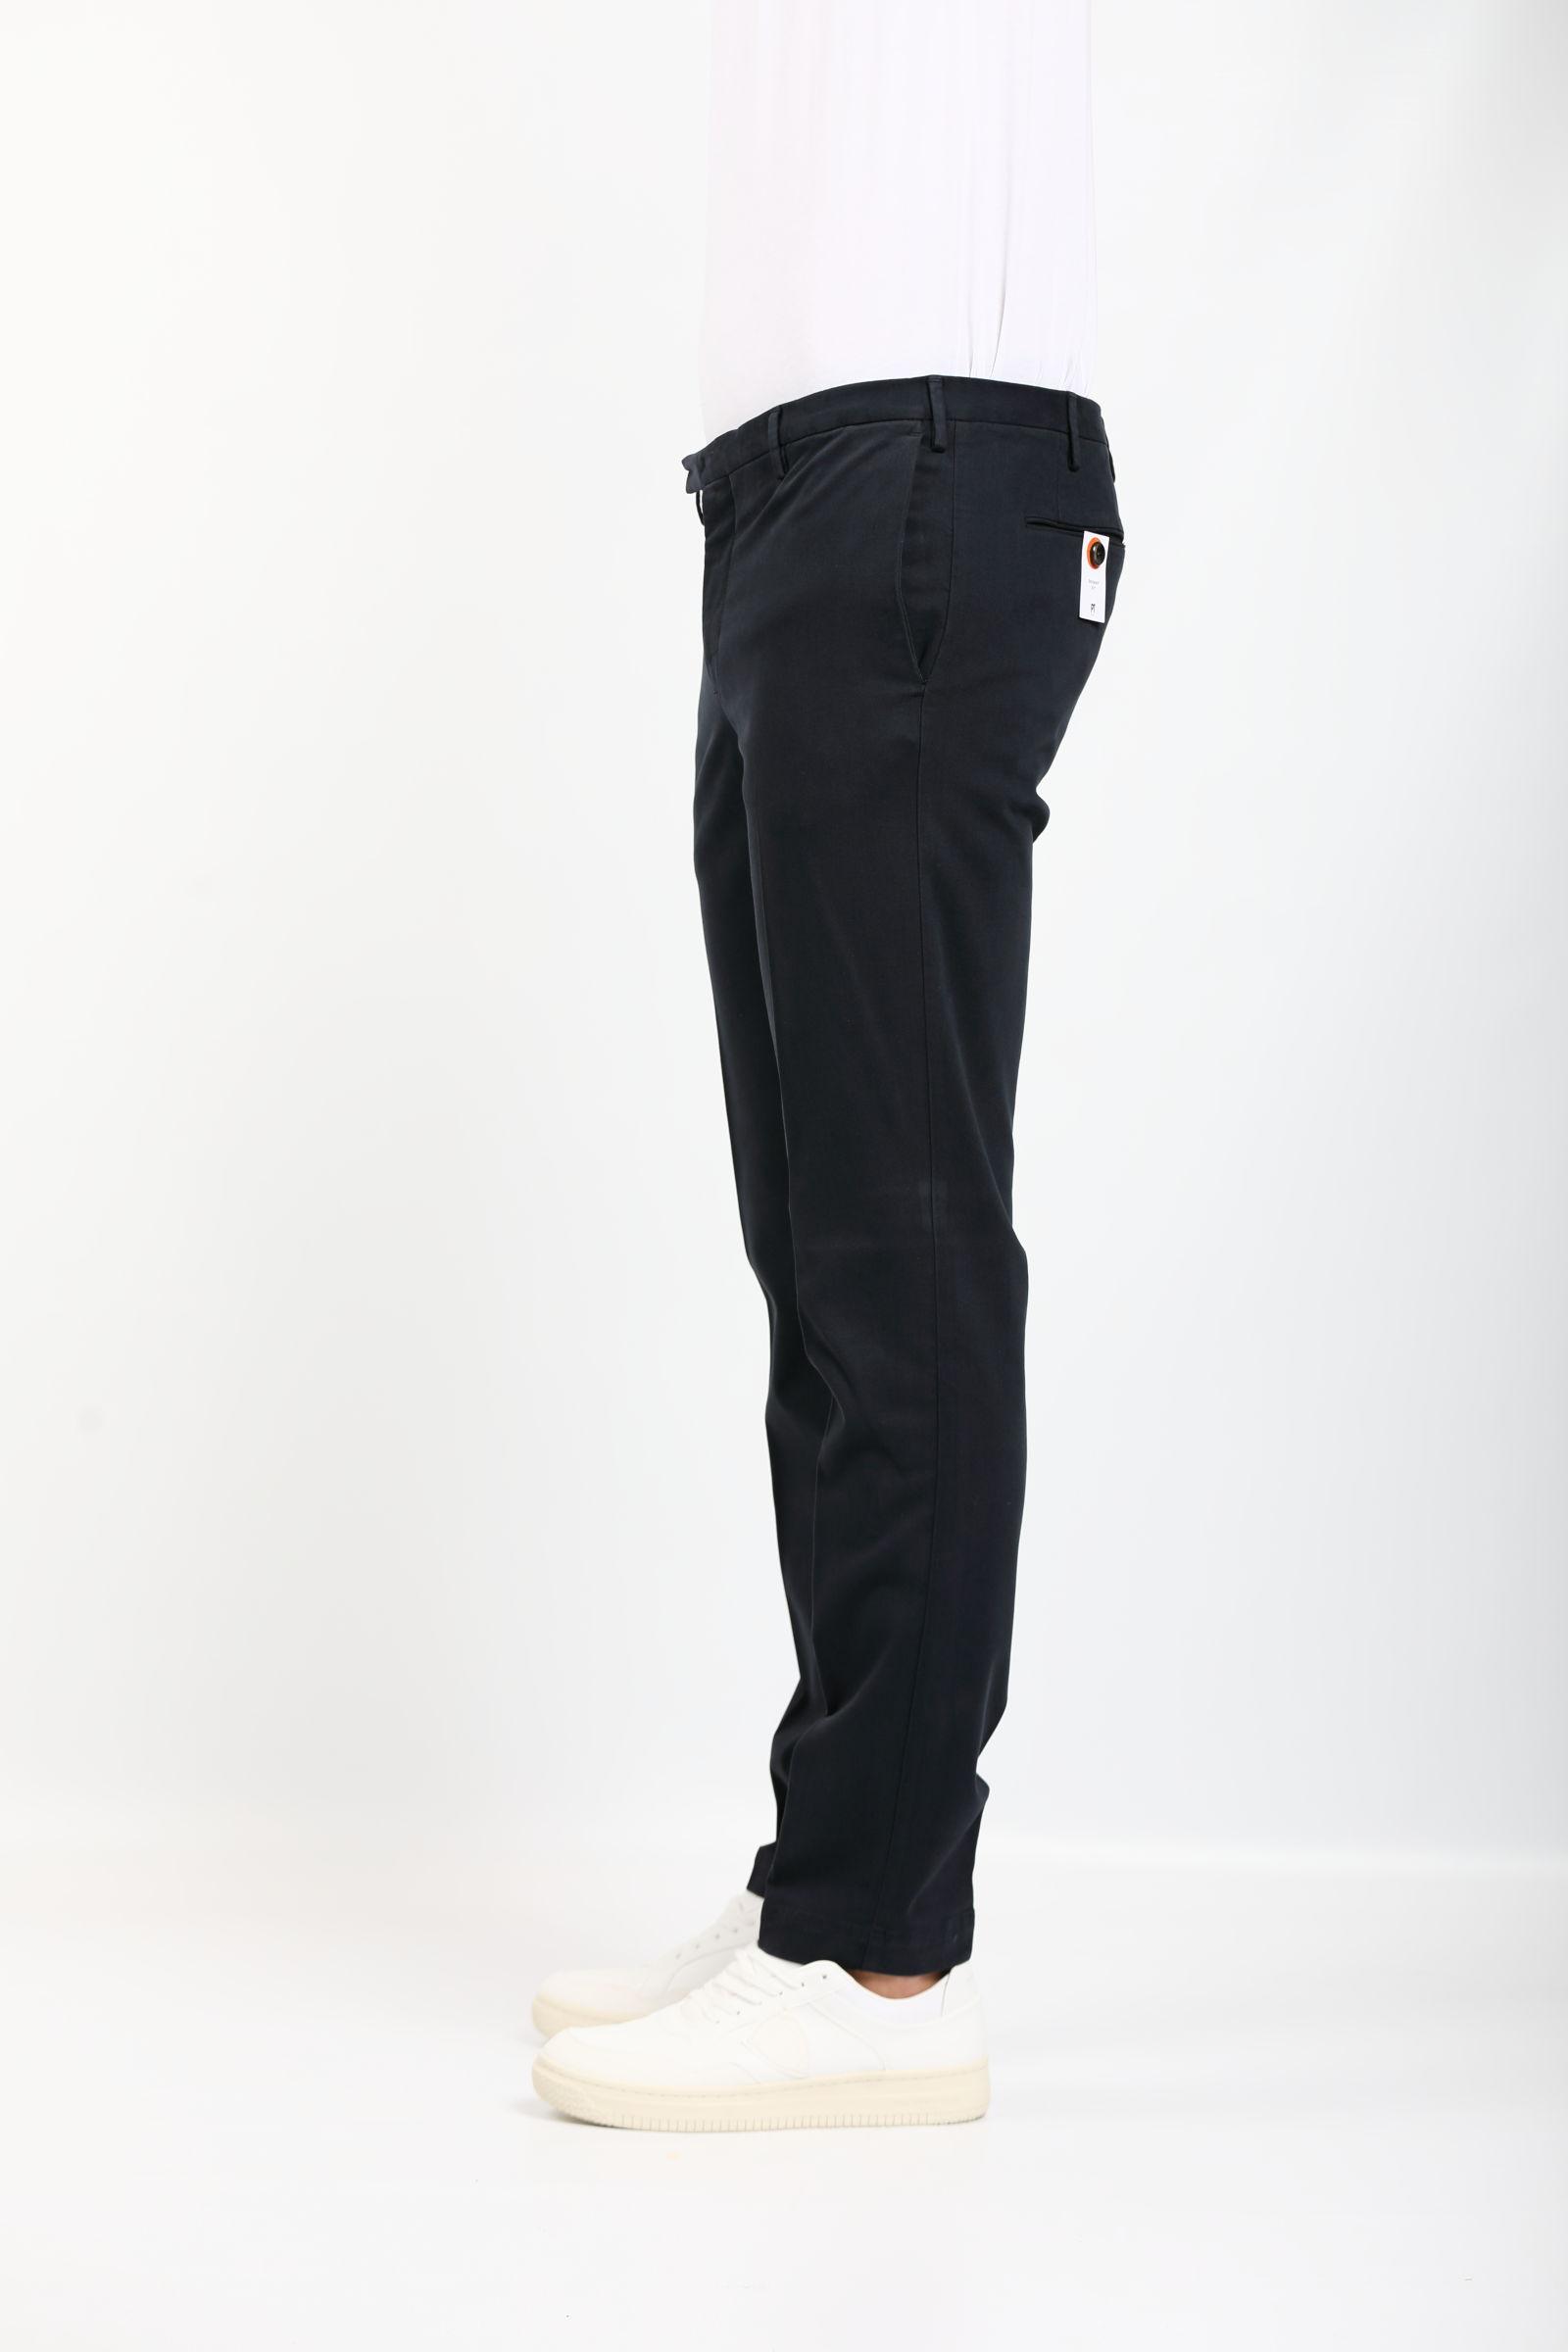 GABARDINE TROUSERS PT TORINO | Pants | KTZEZE00CL1-NU460369